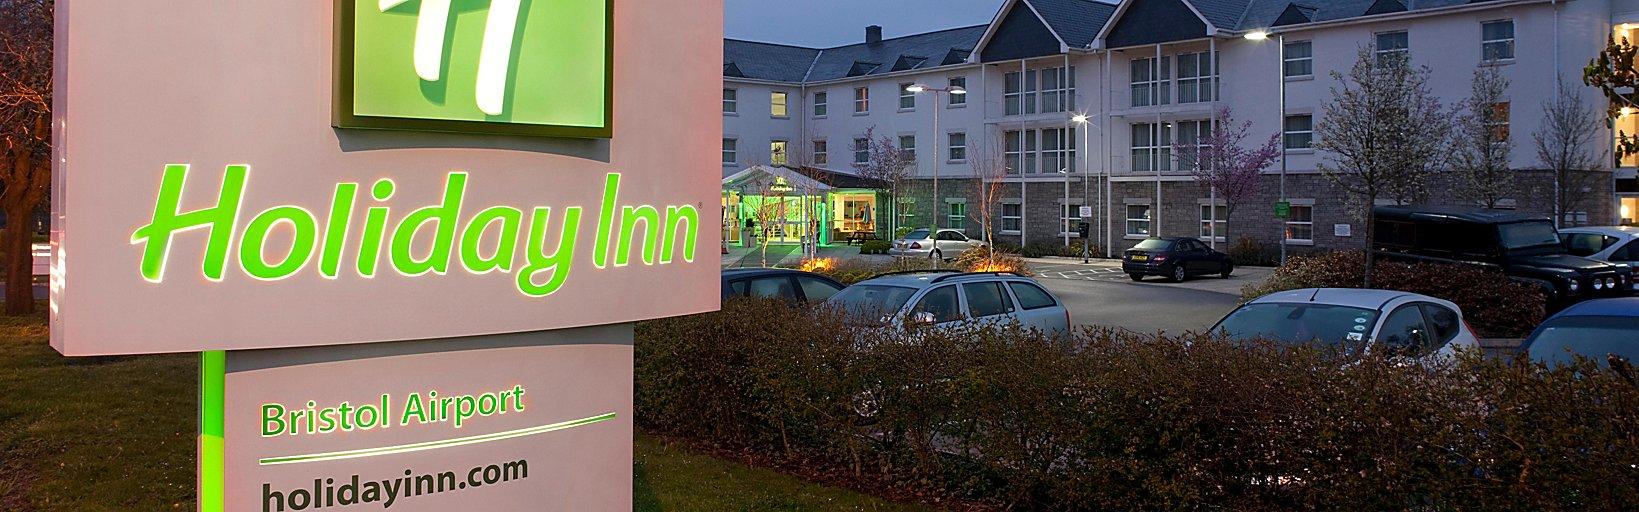 Hotels Near Bristol Airport: Holiday Inn Bristol Airport